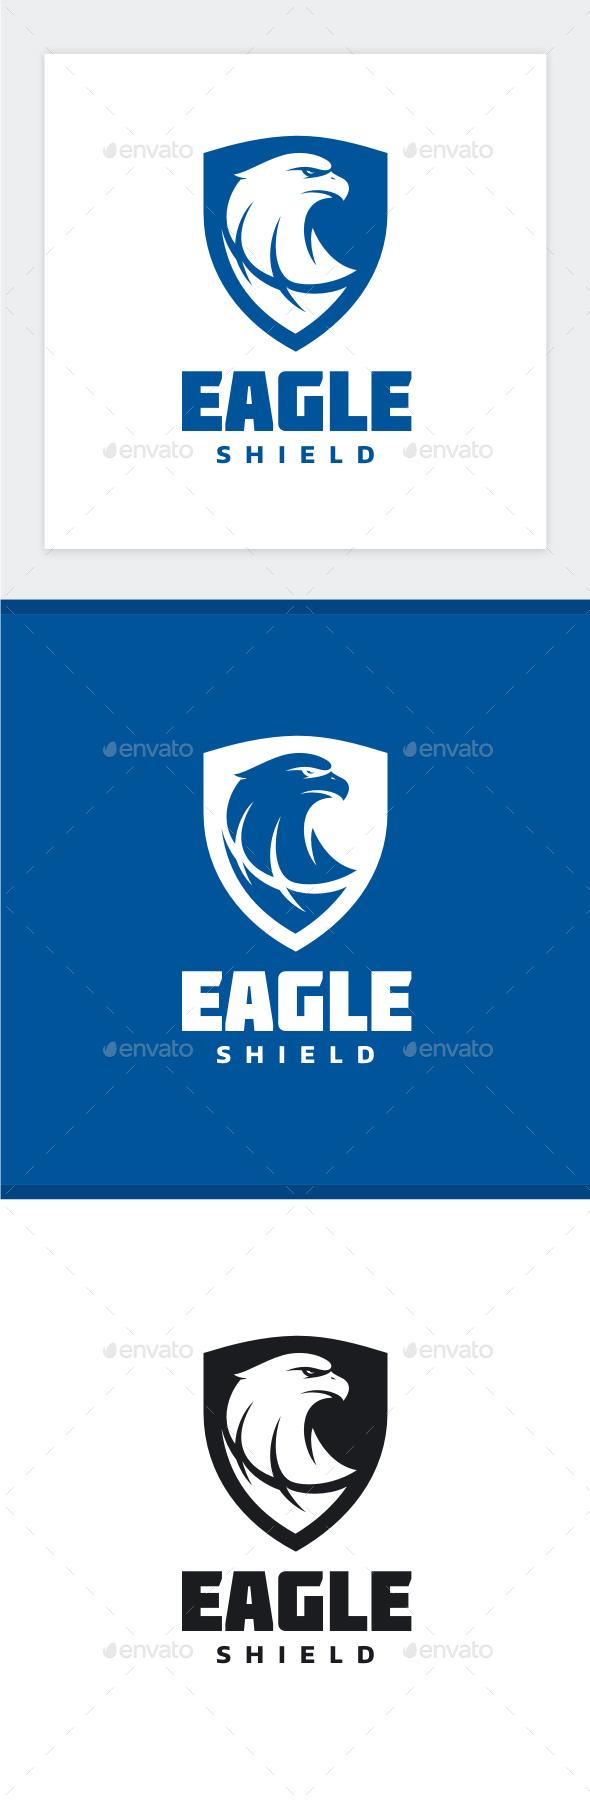 eagle shield logo by yopie graphicriver rh graphicriver net Eagle Shield Badge blue eagle shield logo name